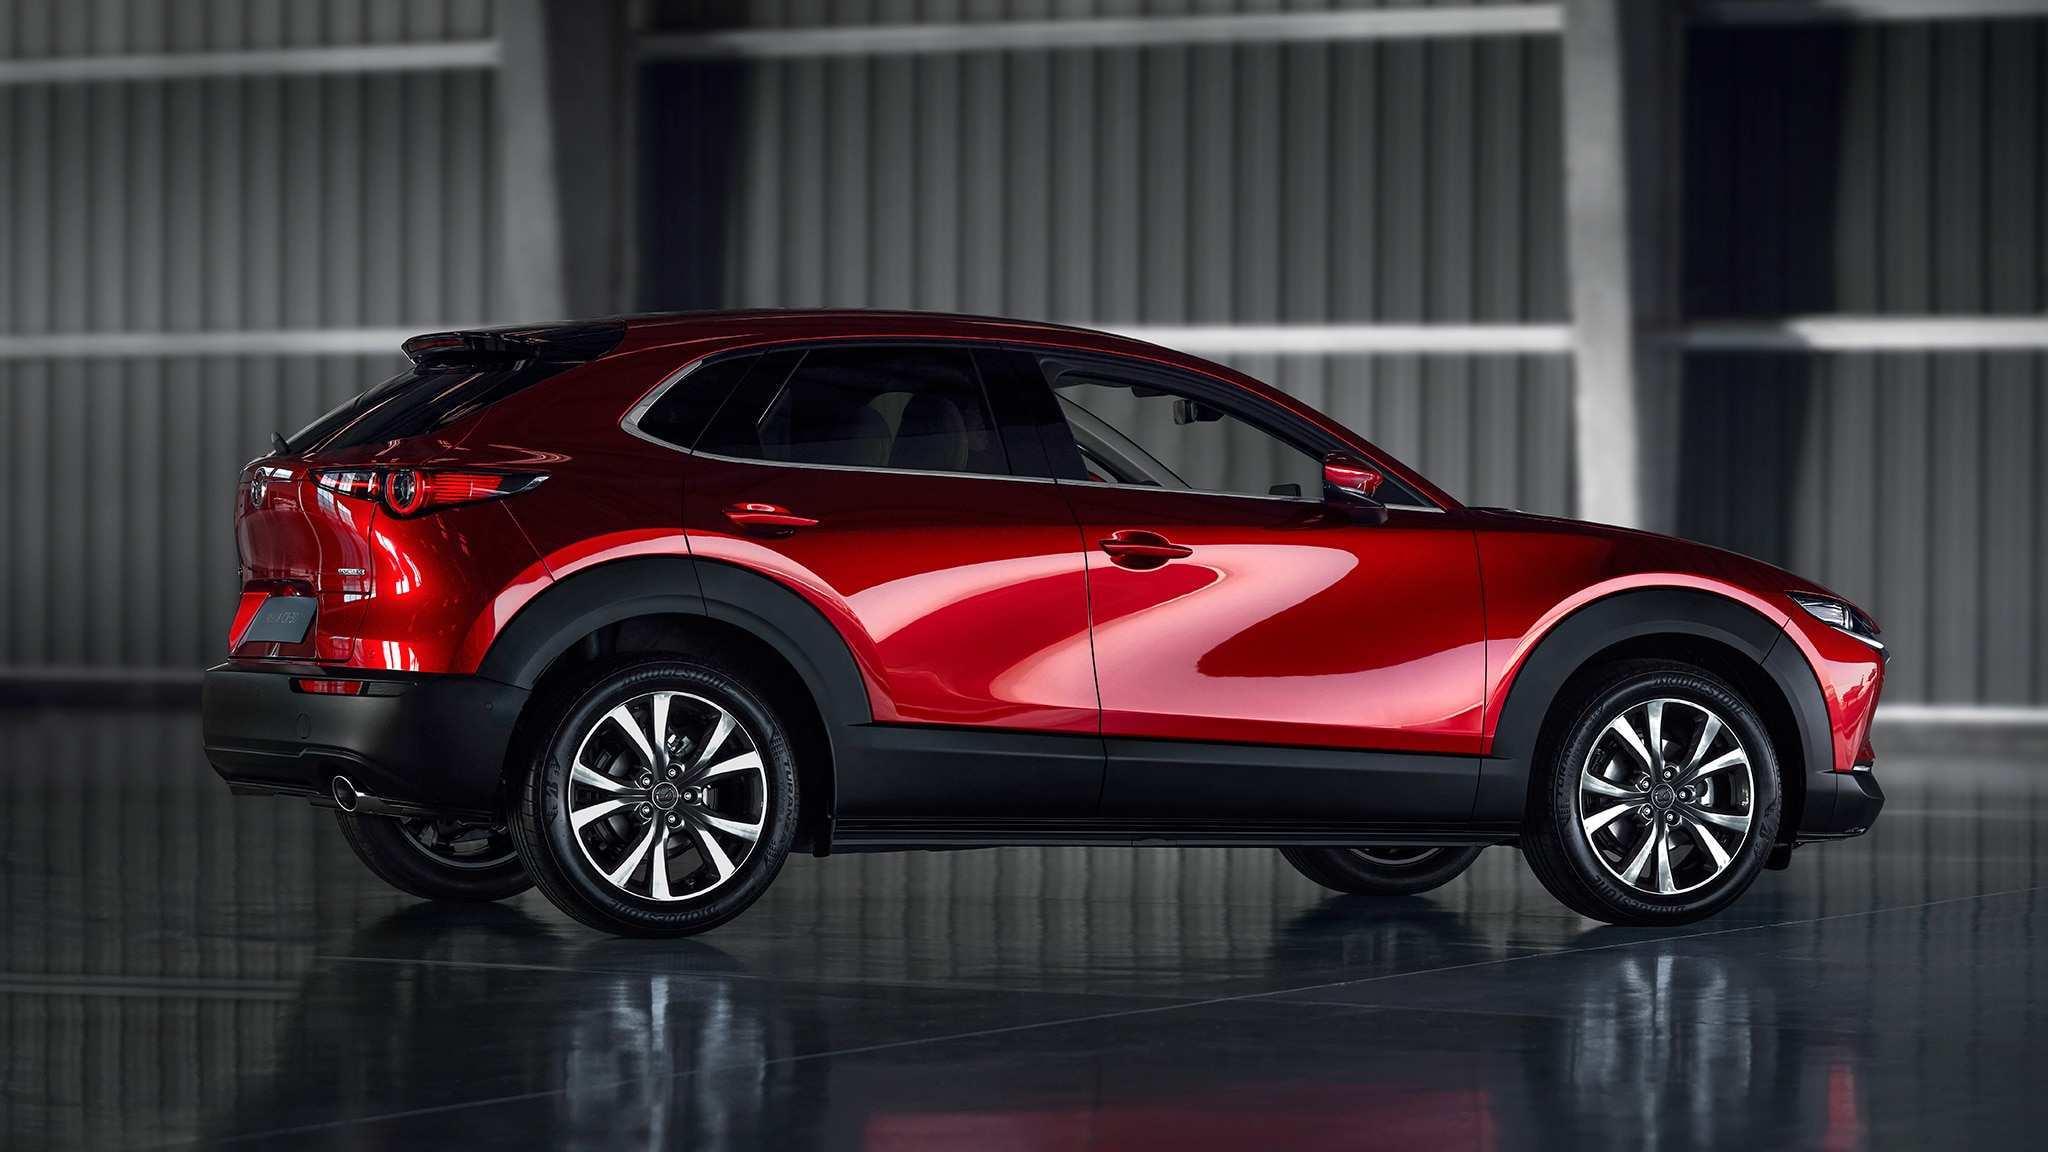 74 The Mazda New Suv 2020 Price by Mazda New Suv 2020